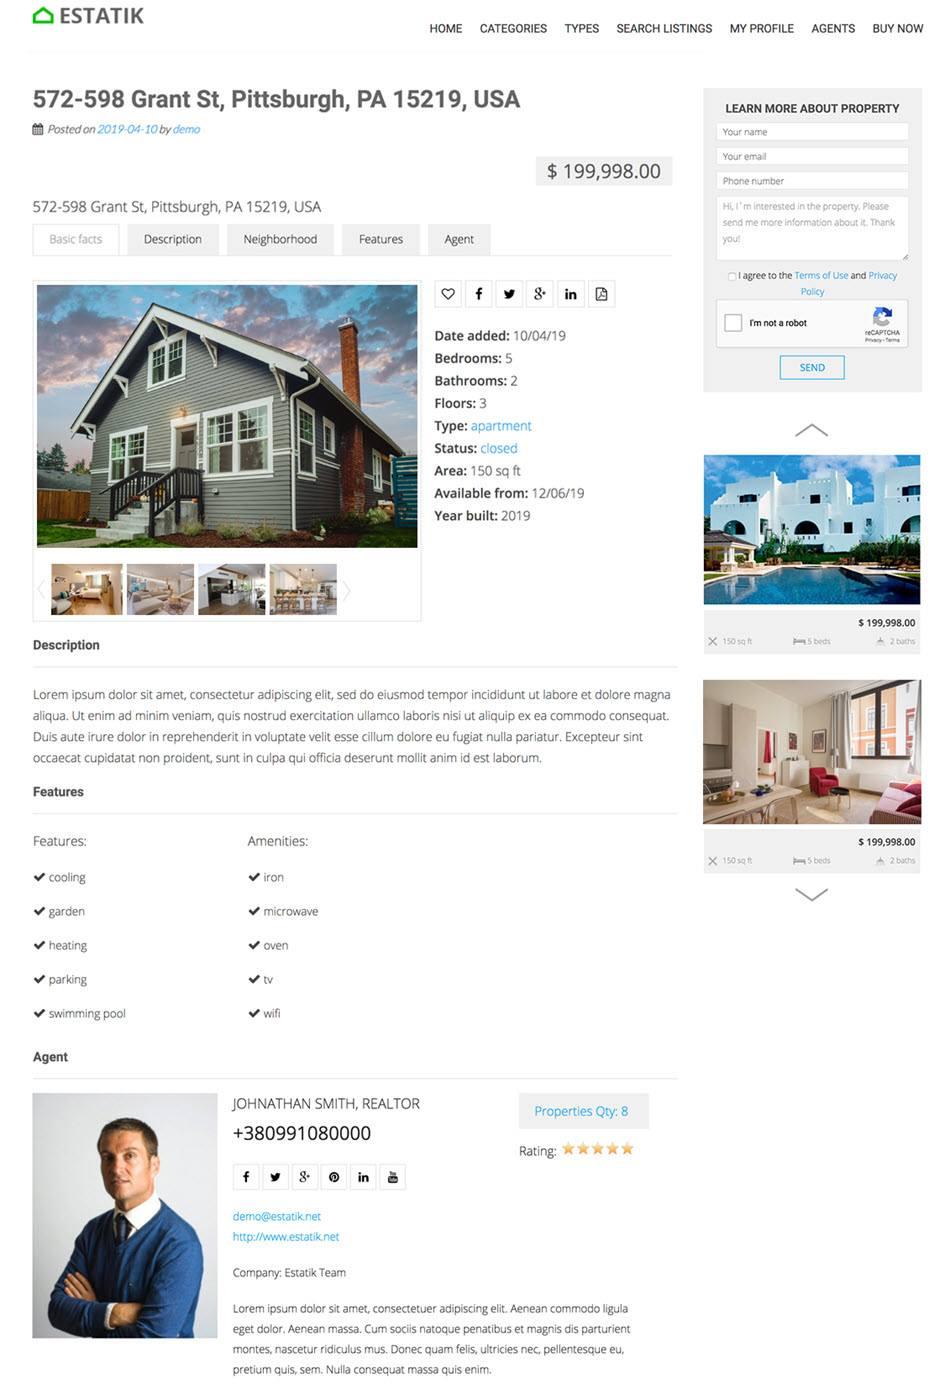 Single Property Page Screenshot